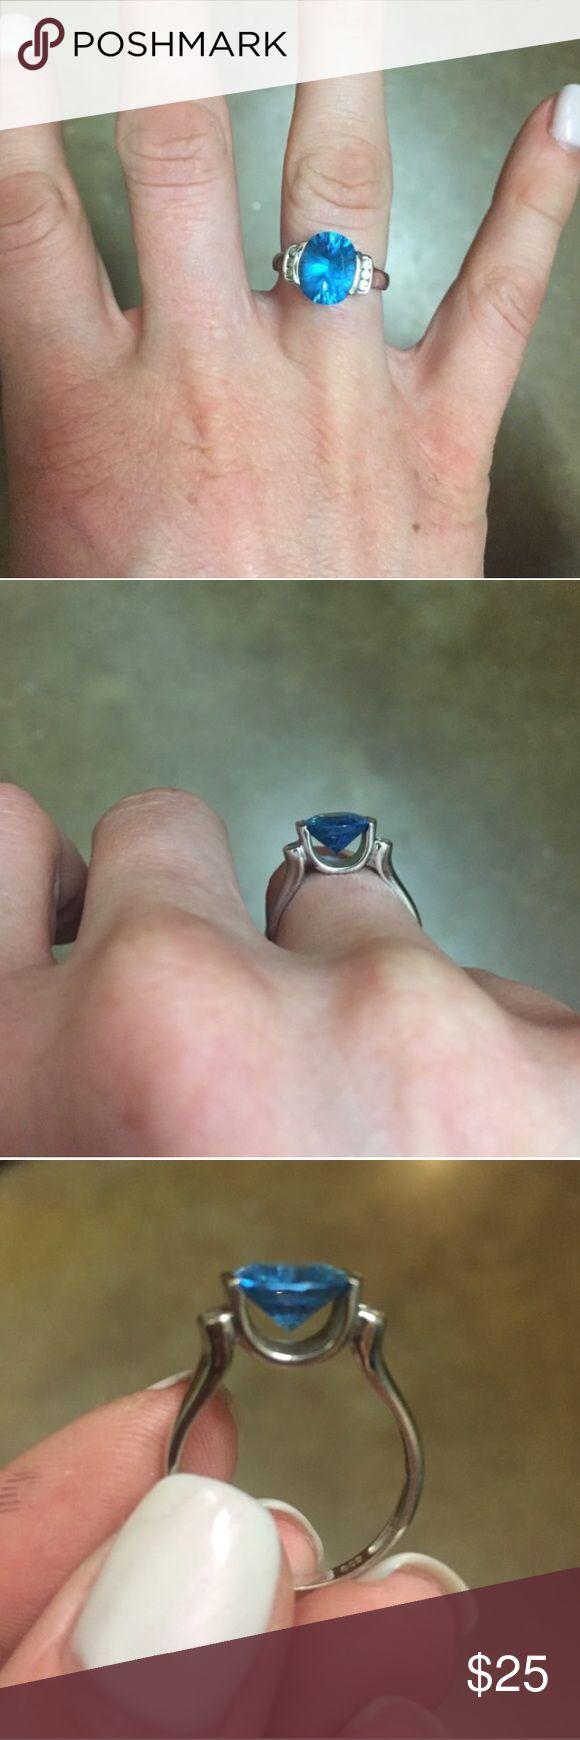 Blue Topaz Ring Costume Jewelry